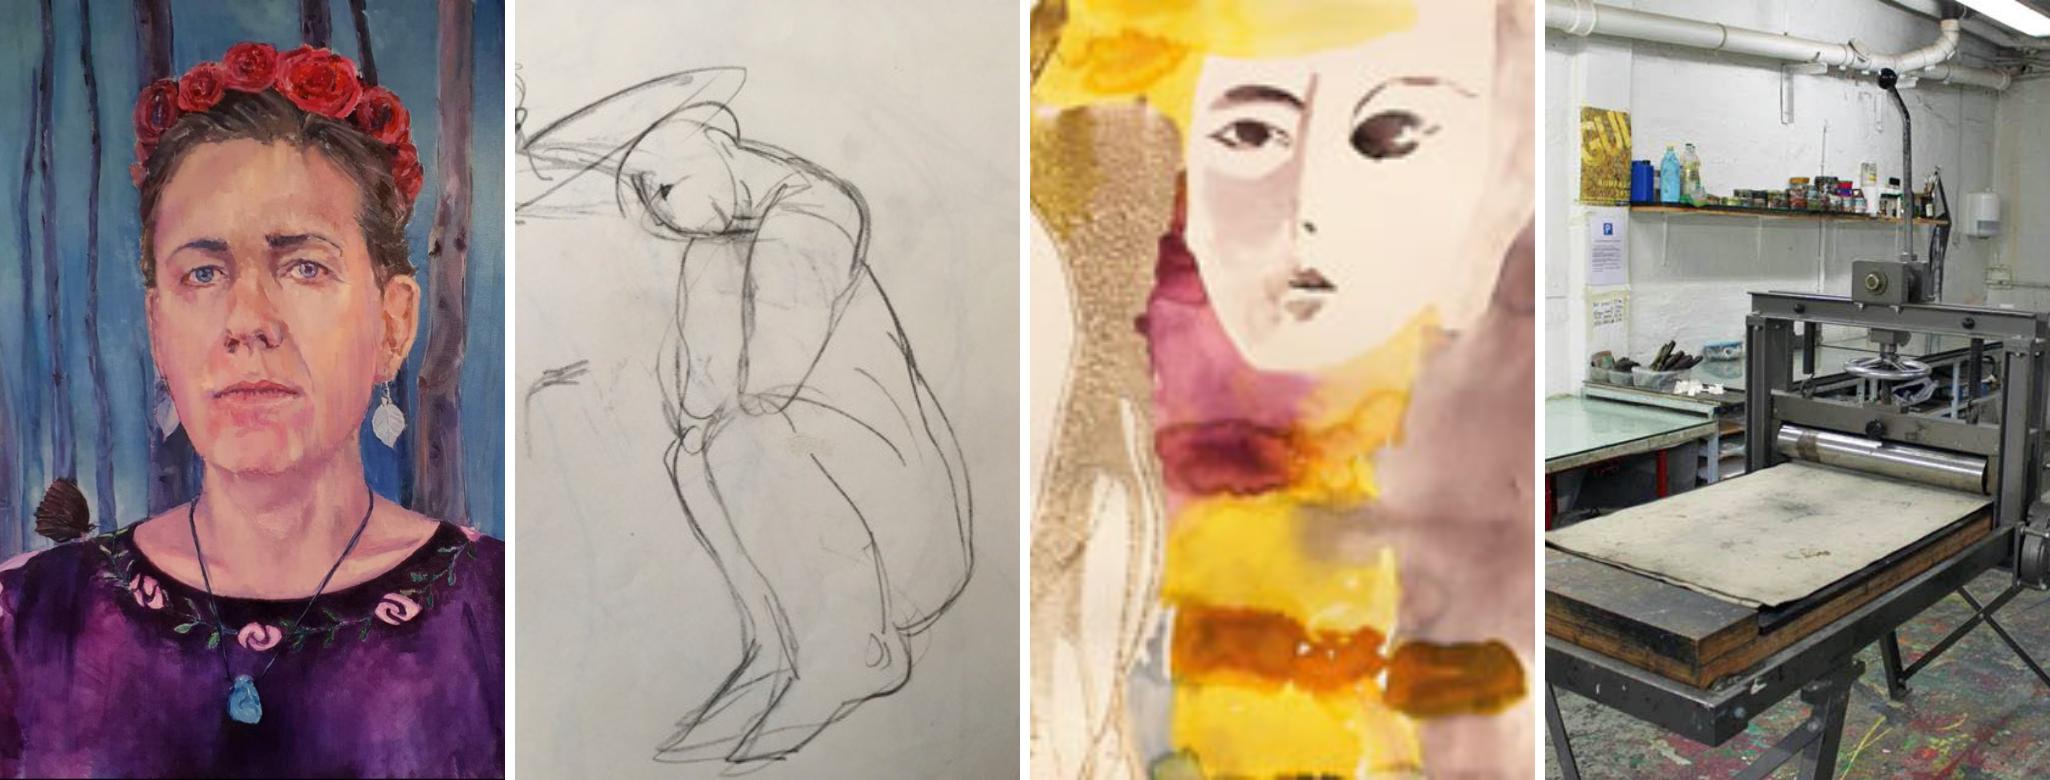 Kunst sommerkurser 2021 Paarup Aftenskole